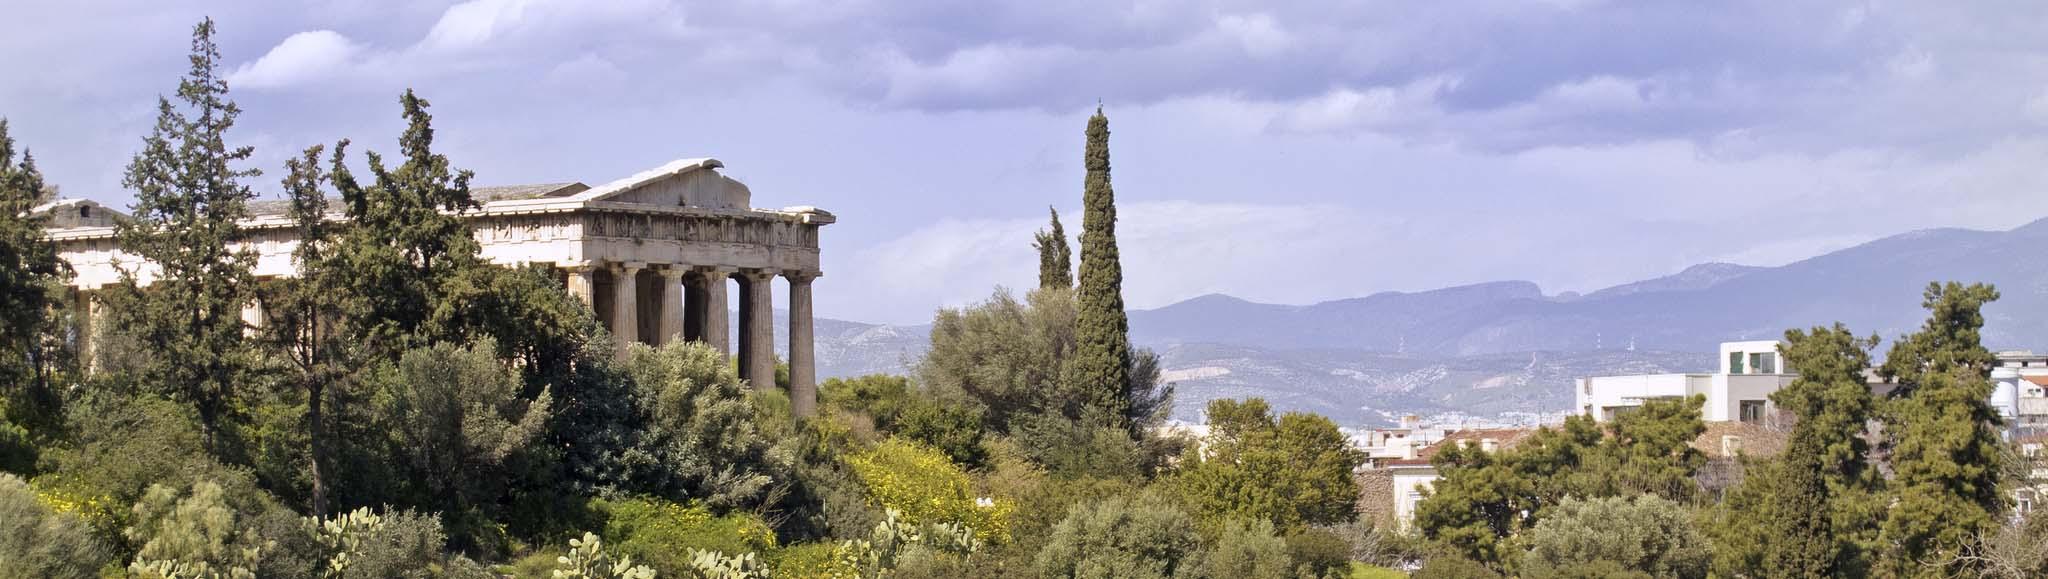 Древняя Агора в Афинах